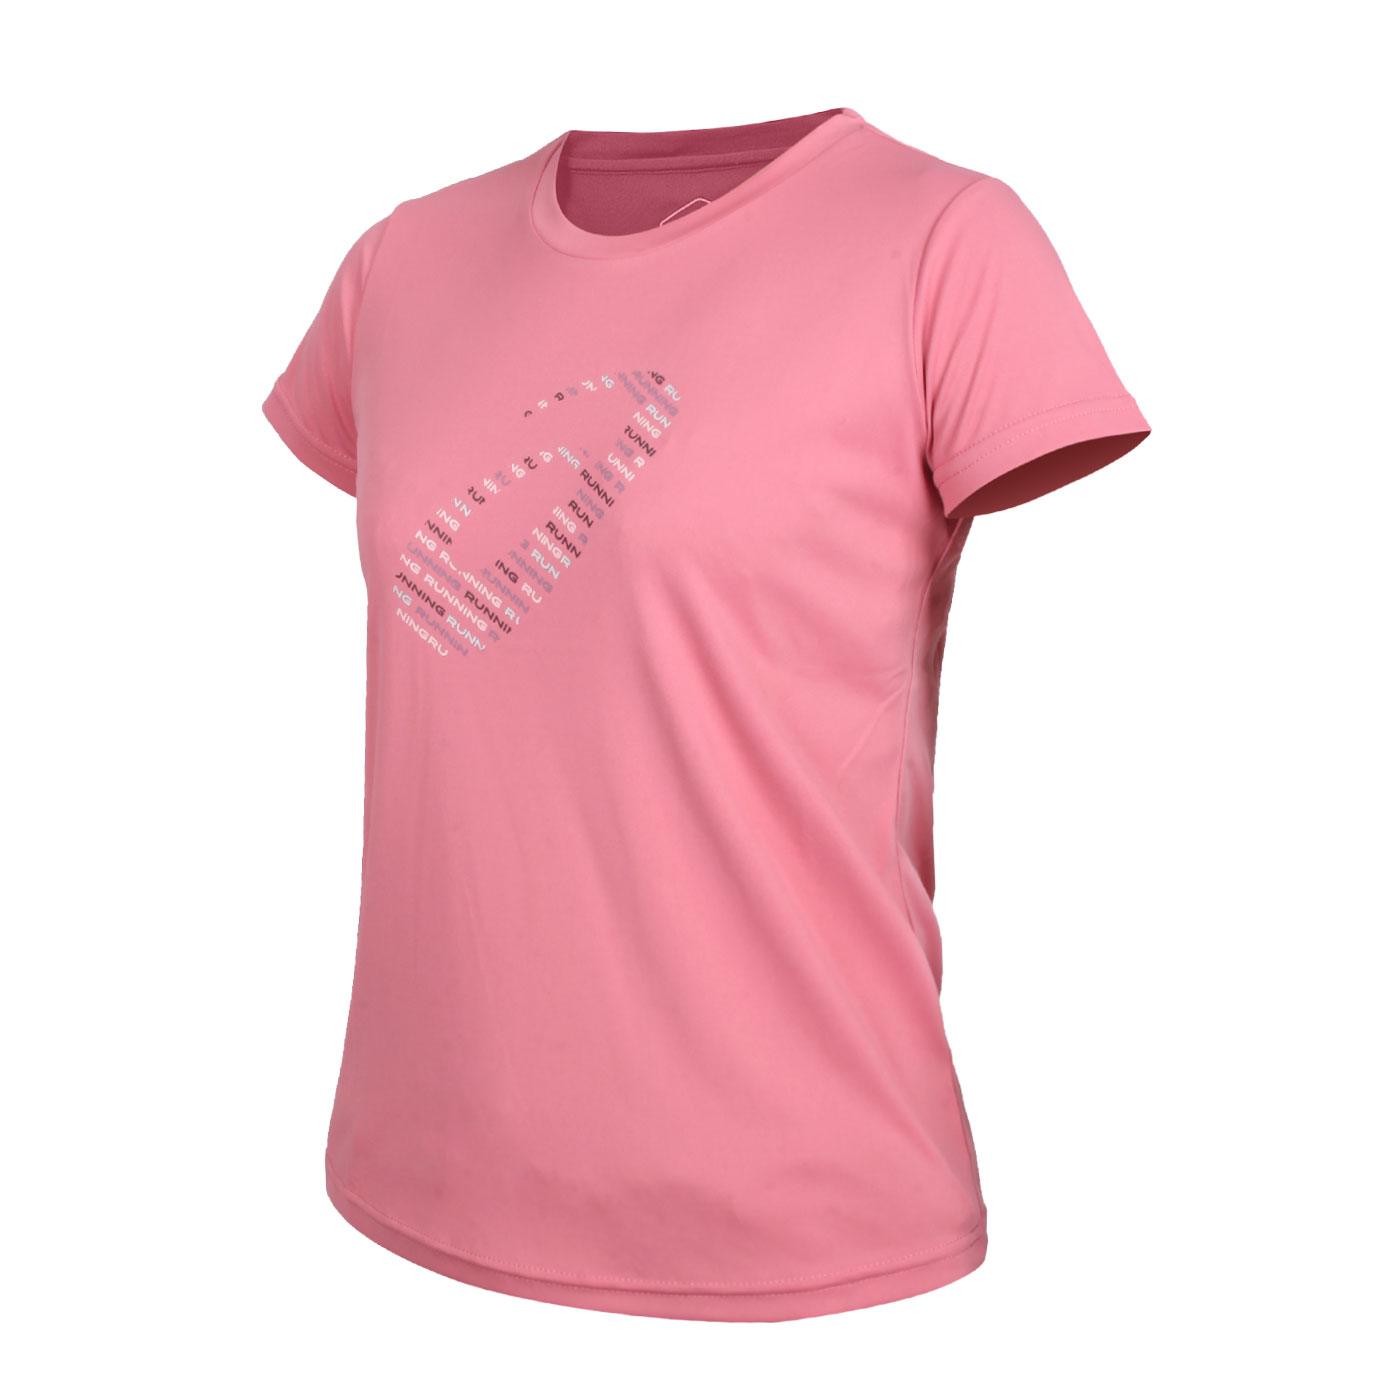 ASICS 女款短袖T恤 2012C345-700 - 粉紅銀